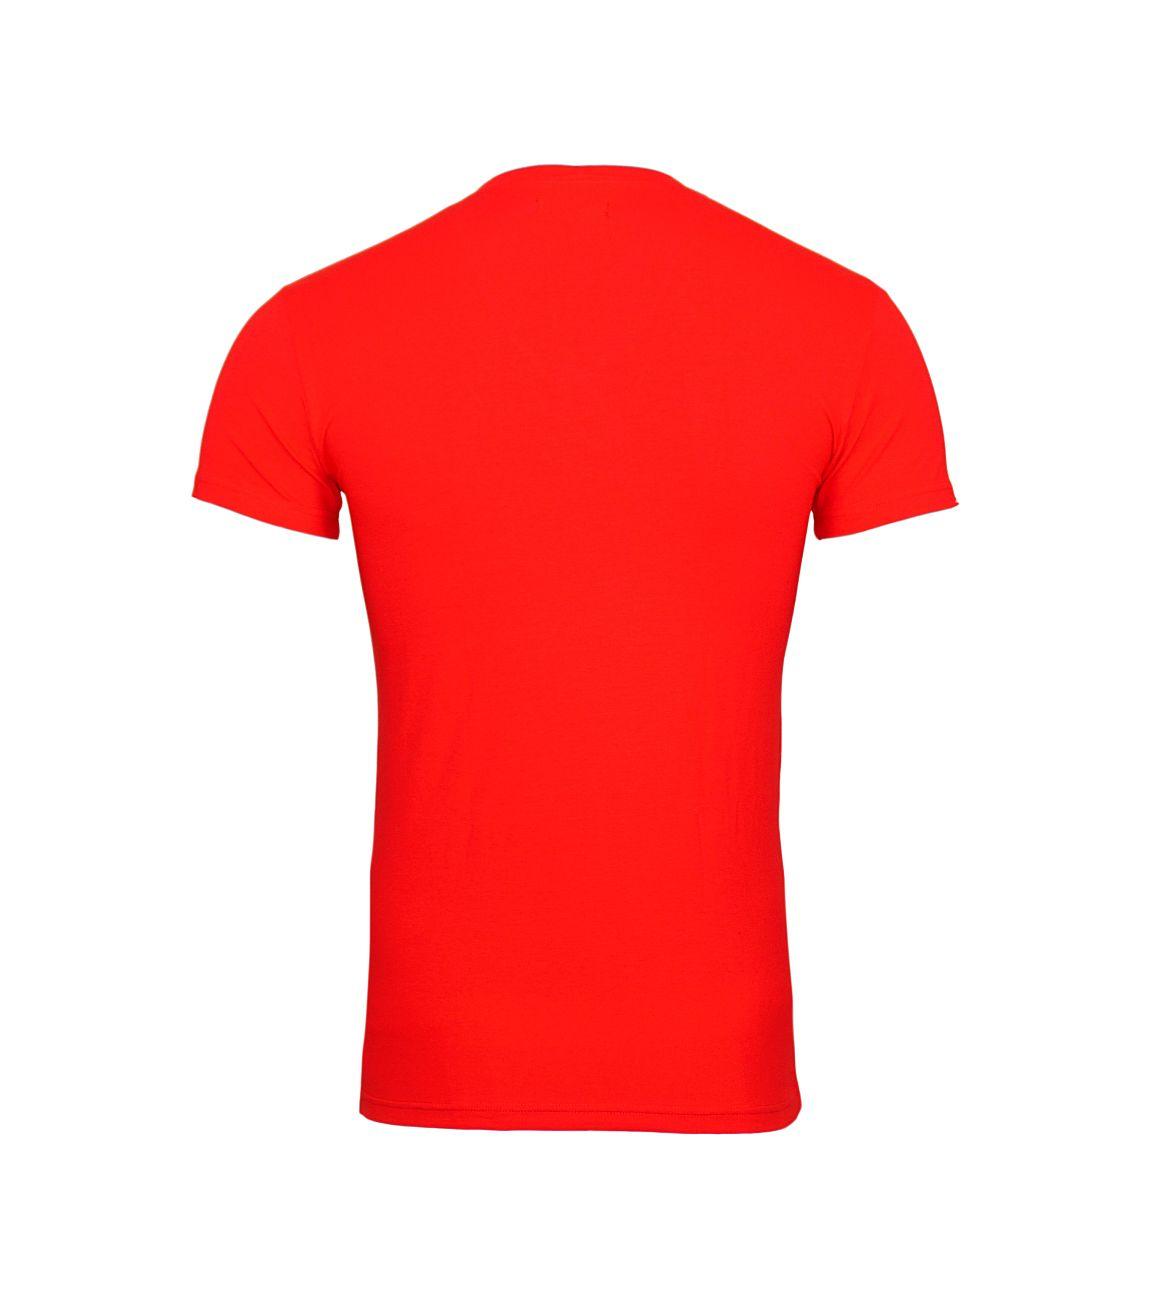 Emporio Armani T-Shirt V-Ausschnitt 110810 8P512 17574 TANGO RED F18-EAT1